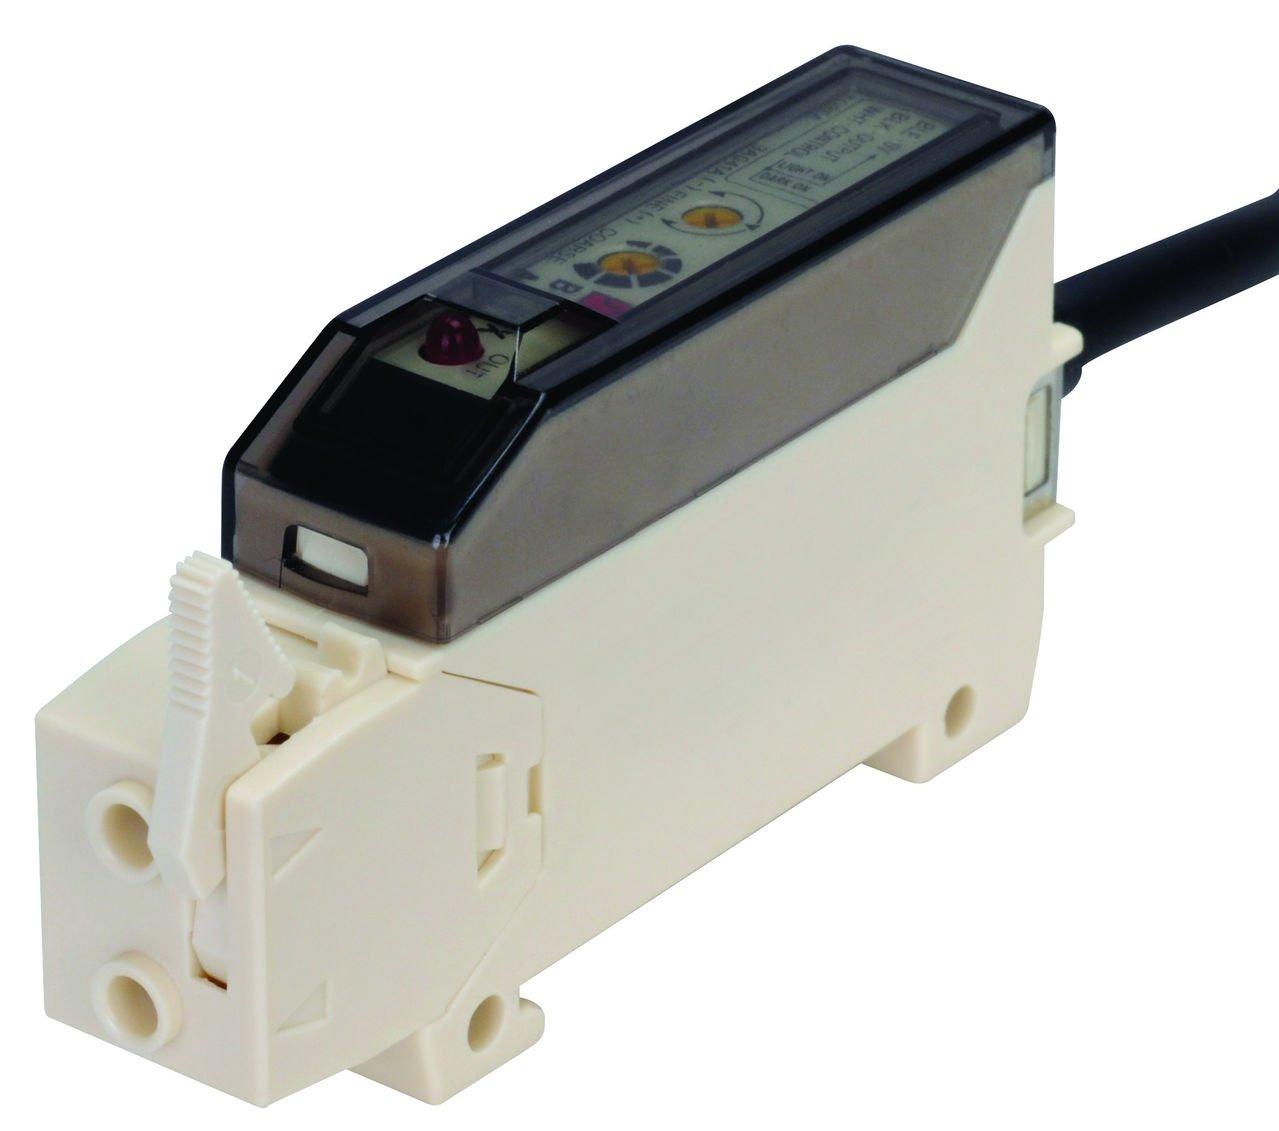 AUTONICS BF3RX Amplifier, Fiber Optic, Light & Dark On, NPN Output, 12-24 VDC (fiber req'd)